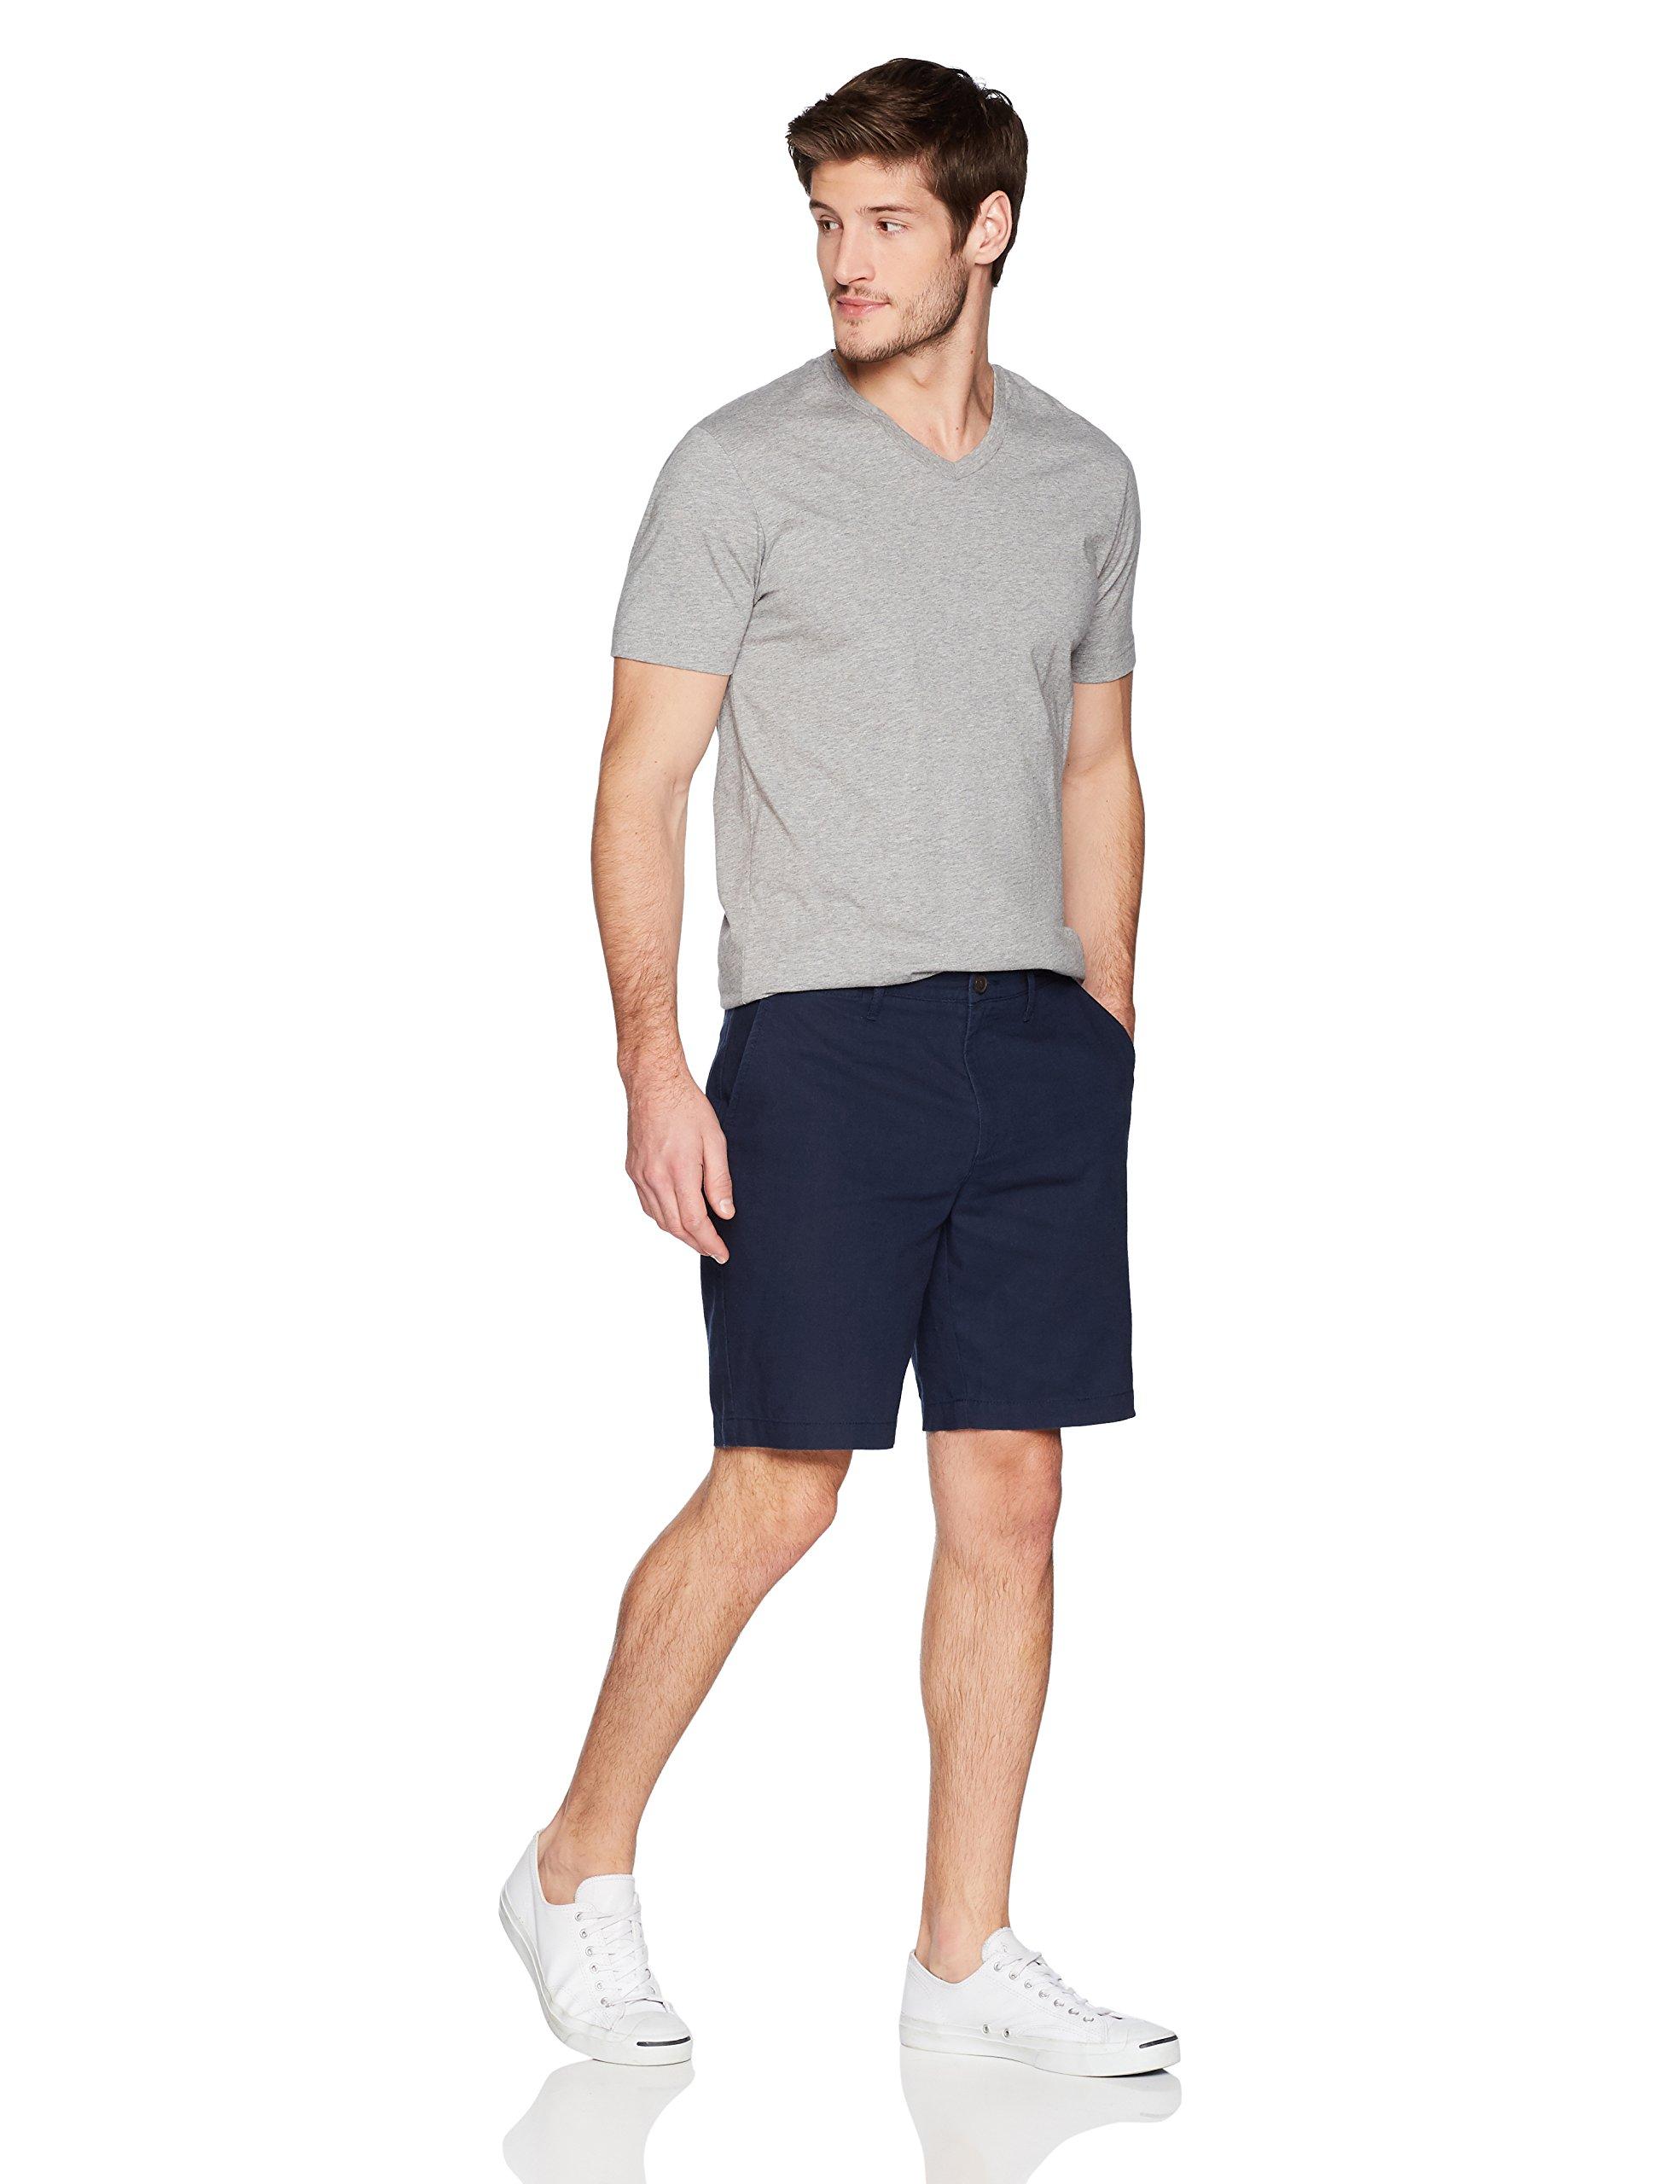 Goodthreads Men's 9'' Inseam Linen Cotton Short, Navy, 34 by Goodthreads (Image #3)